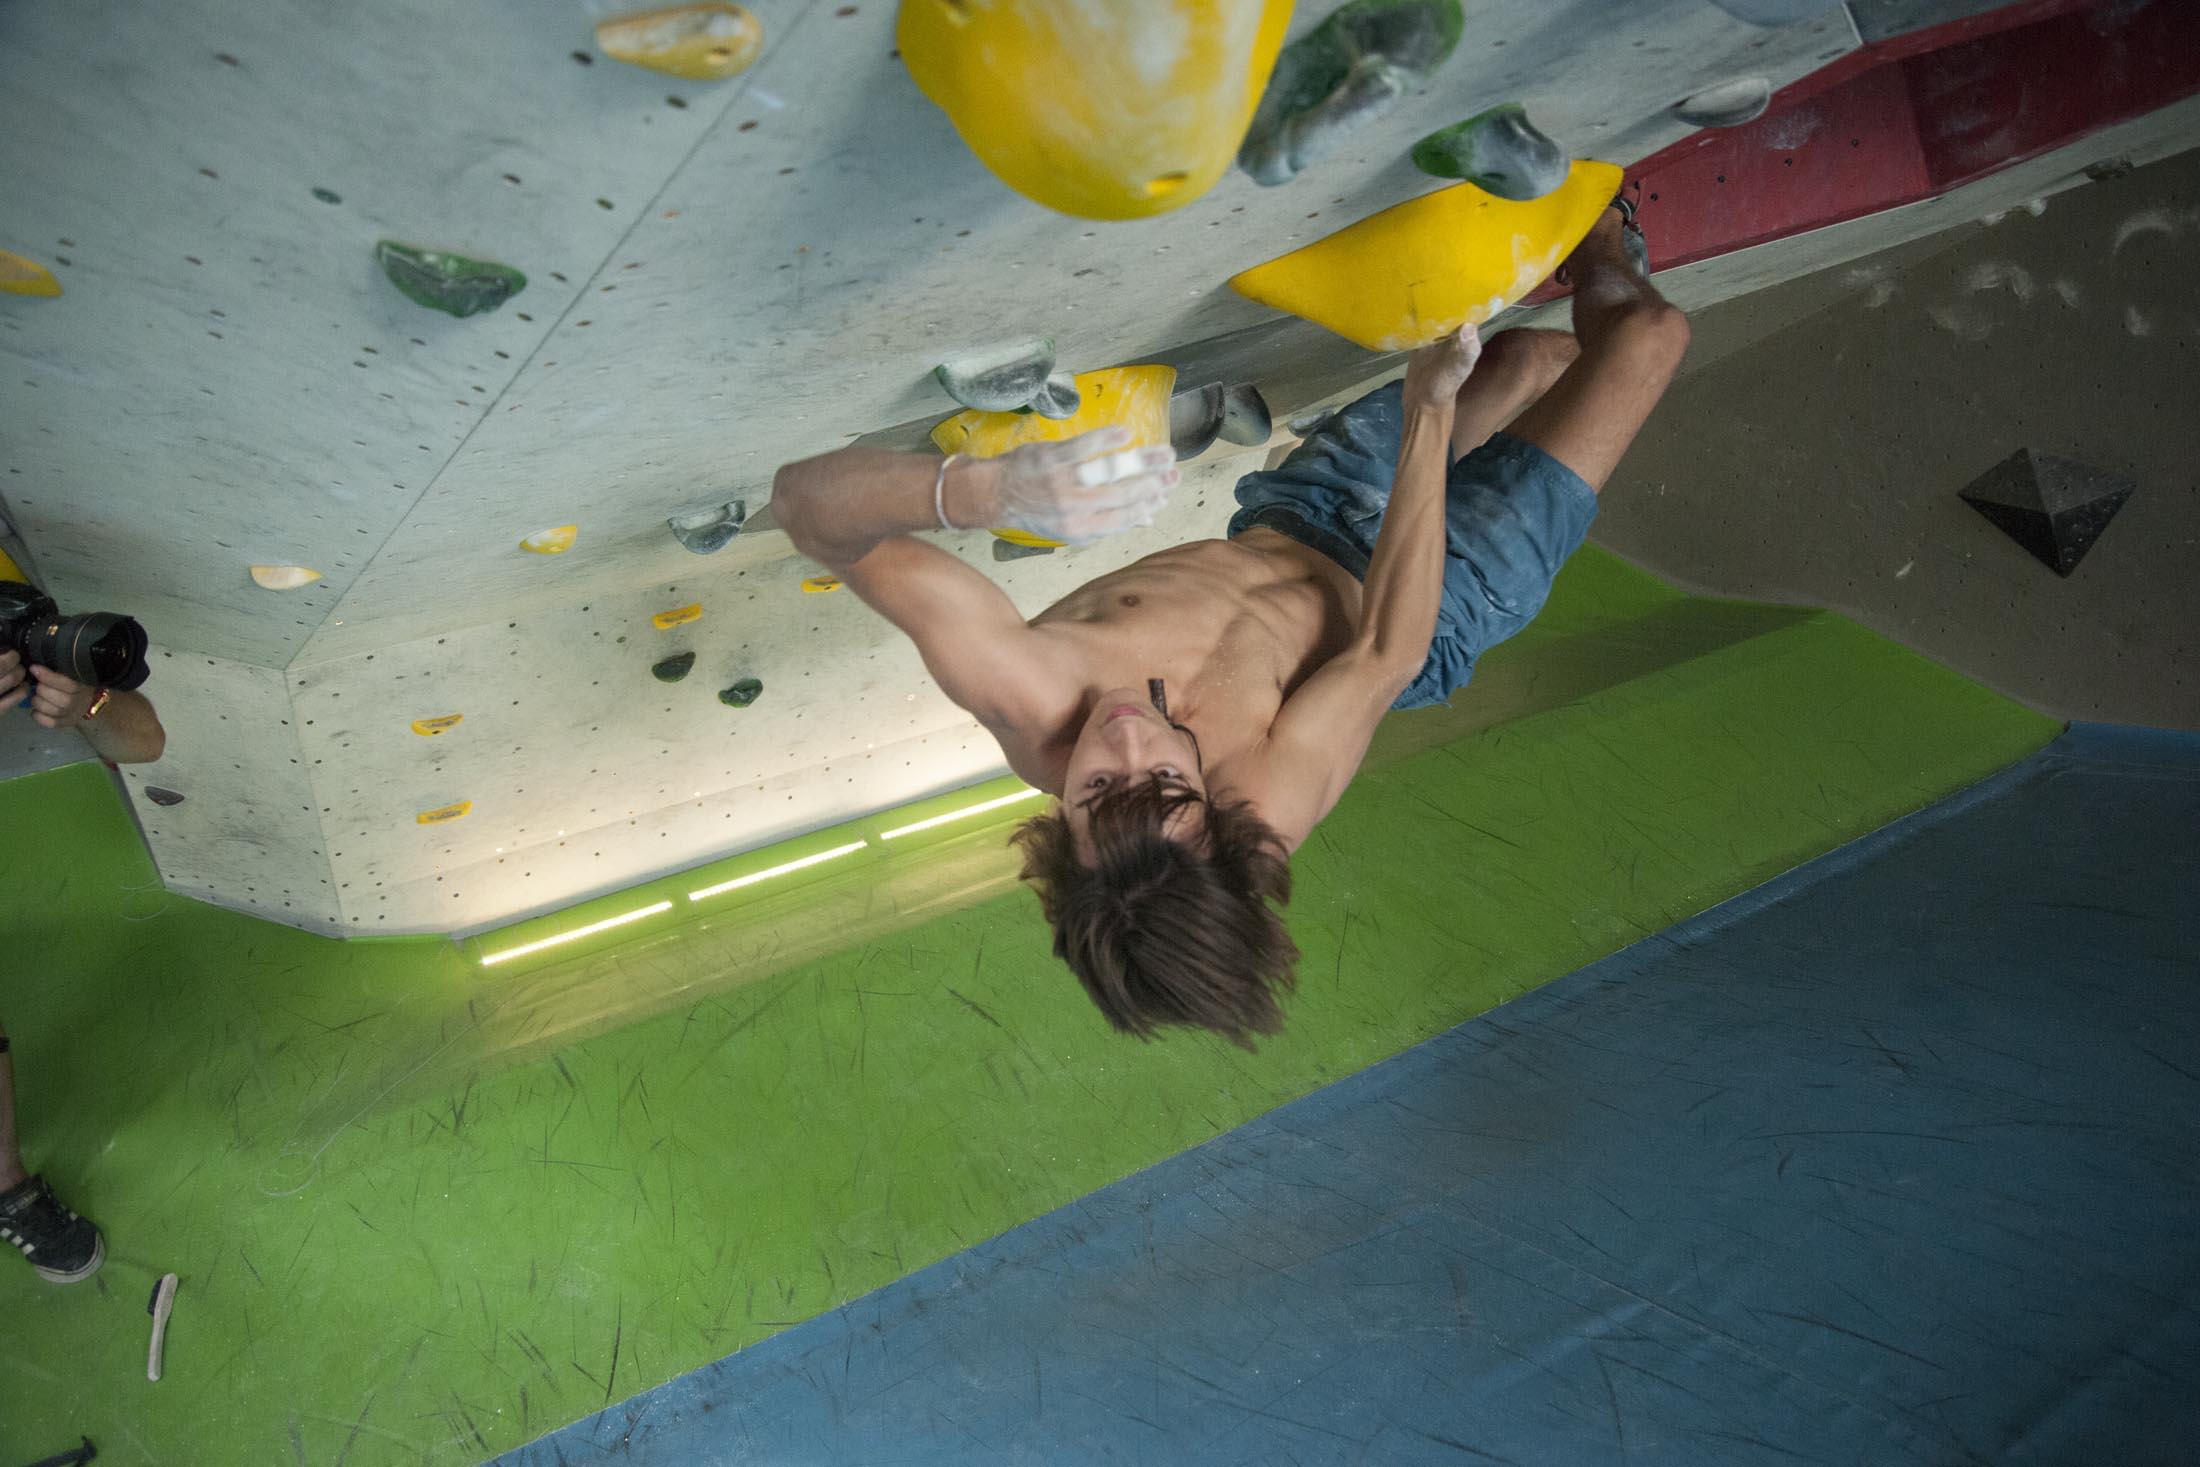 Quali, internationaler bouldercup Frankenjura 2016, BLOCKHELDEN Erlangen, Mammut, Bergfreunde.de, Boulderwettkampf07092016257